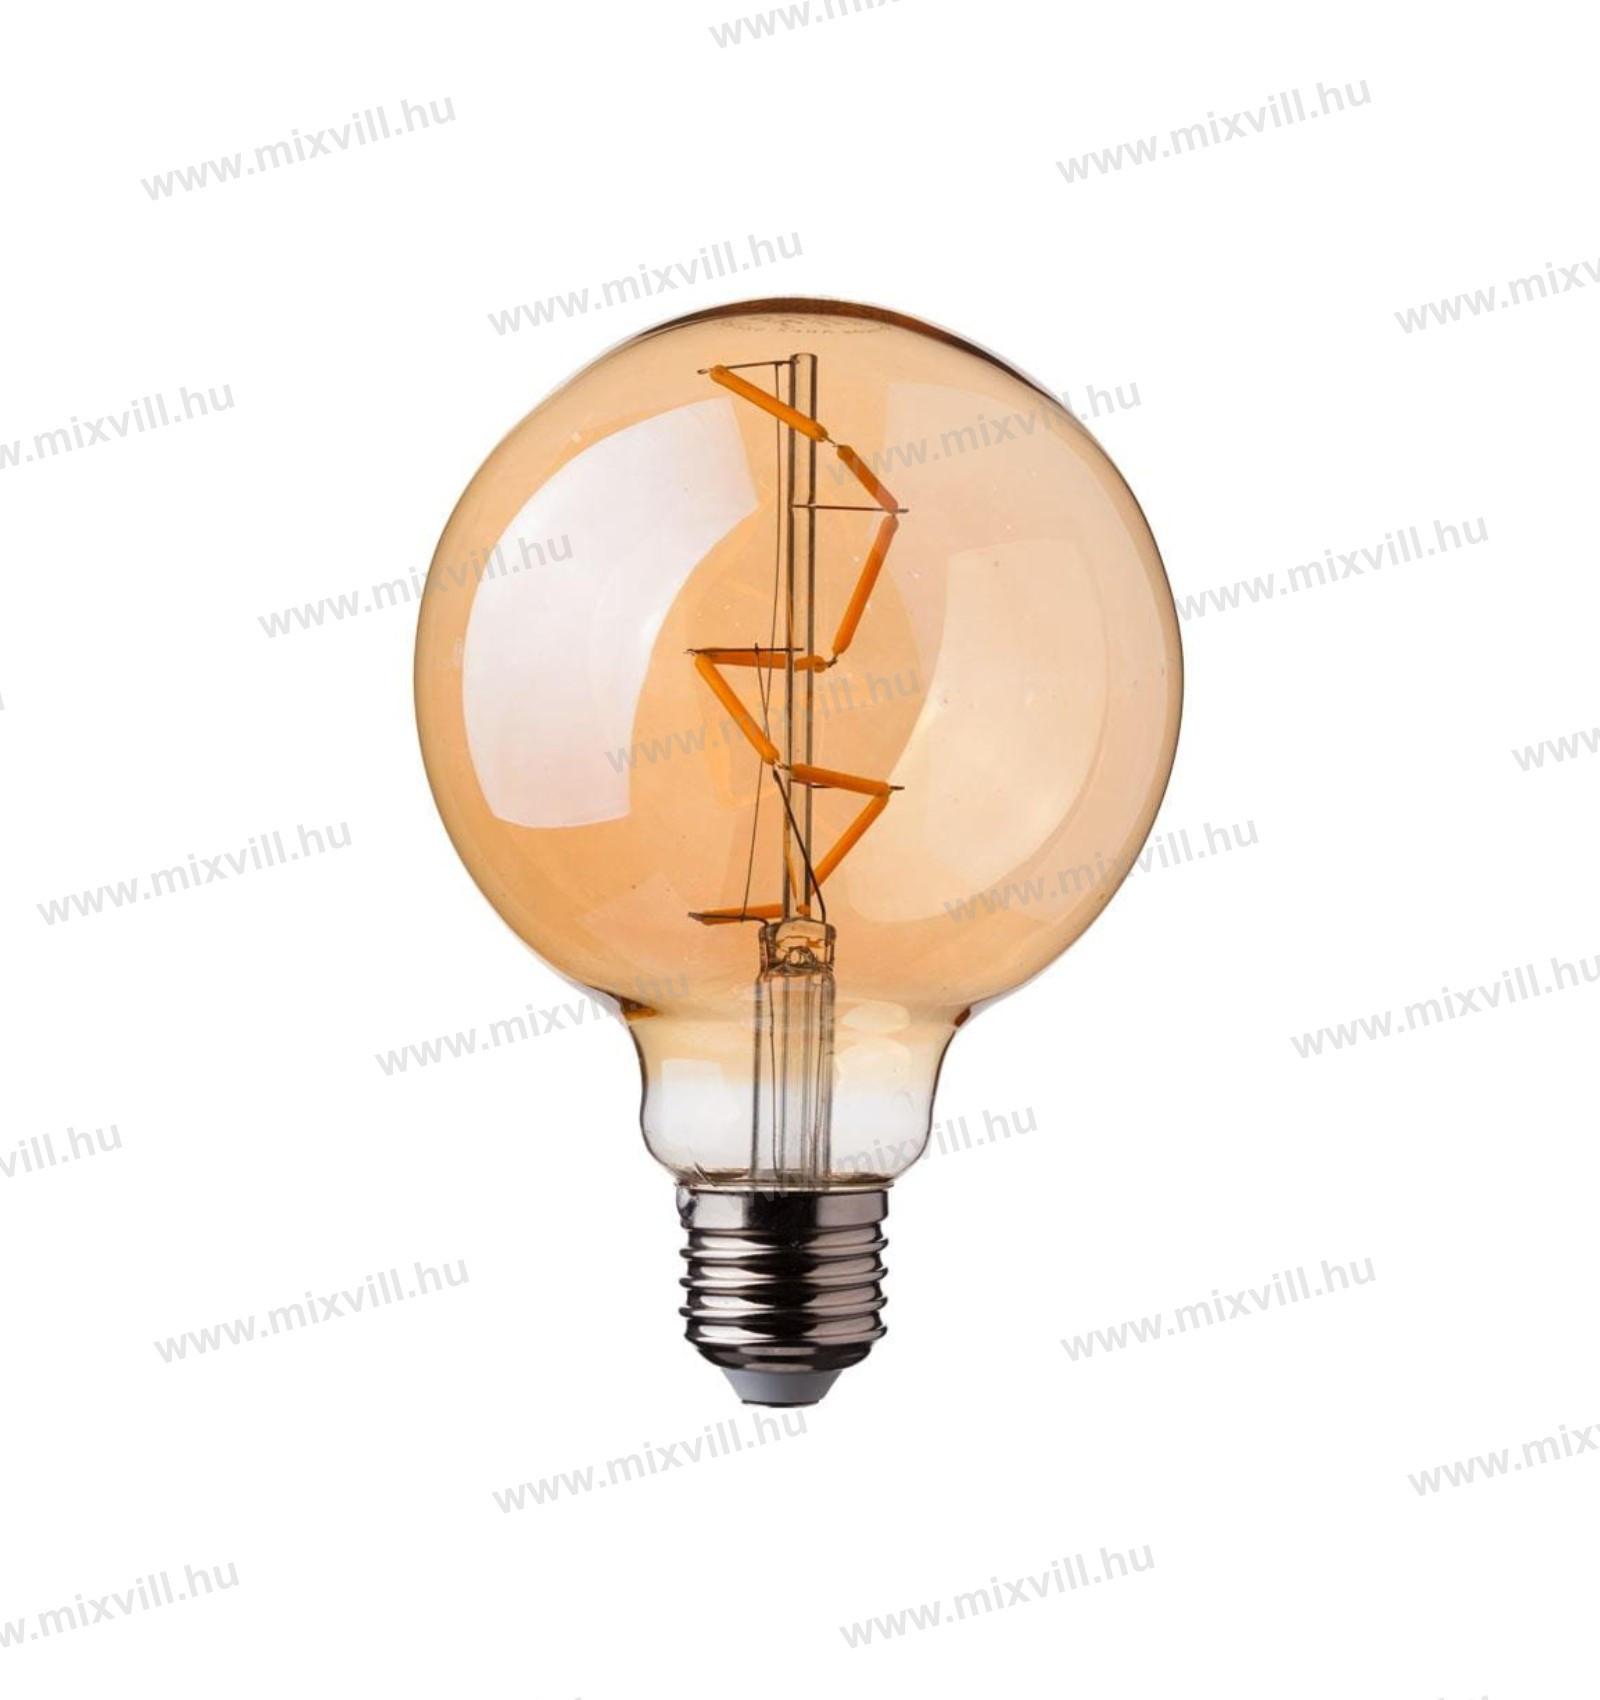 V-TAC-SKU-7146-COG-e27-LED-izzo-4w-G95-glob-Amber-Cover-2200K-meleg-feher